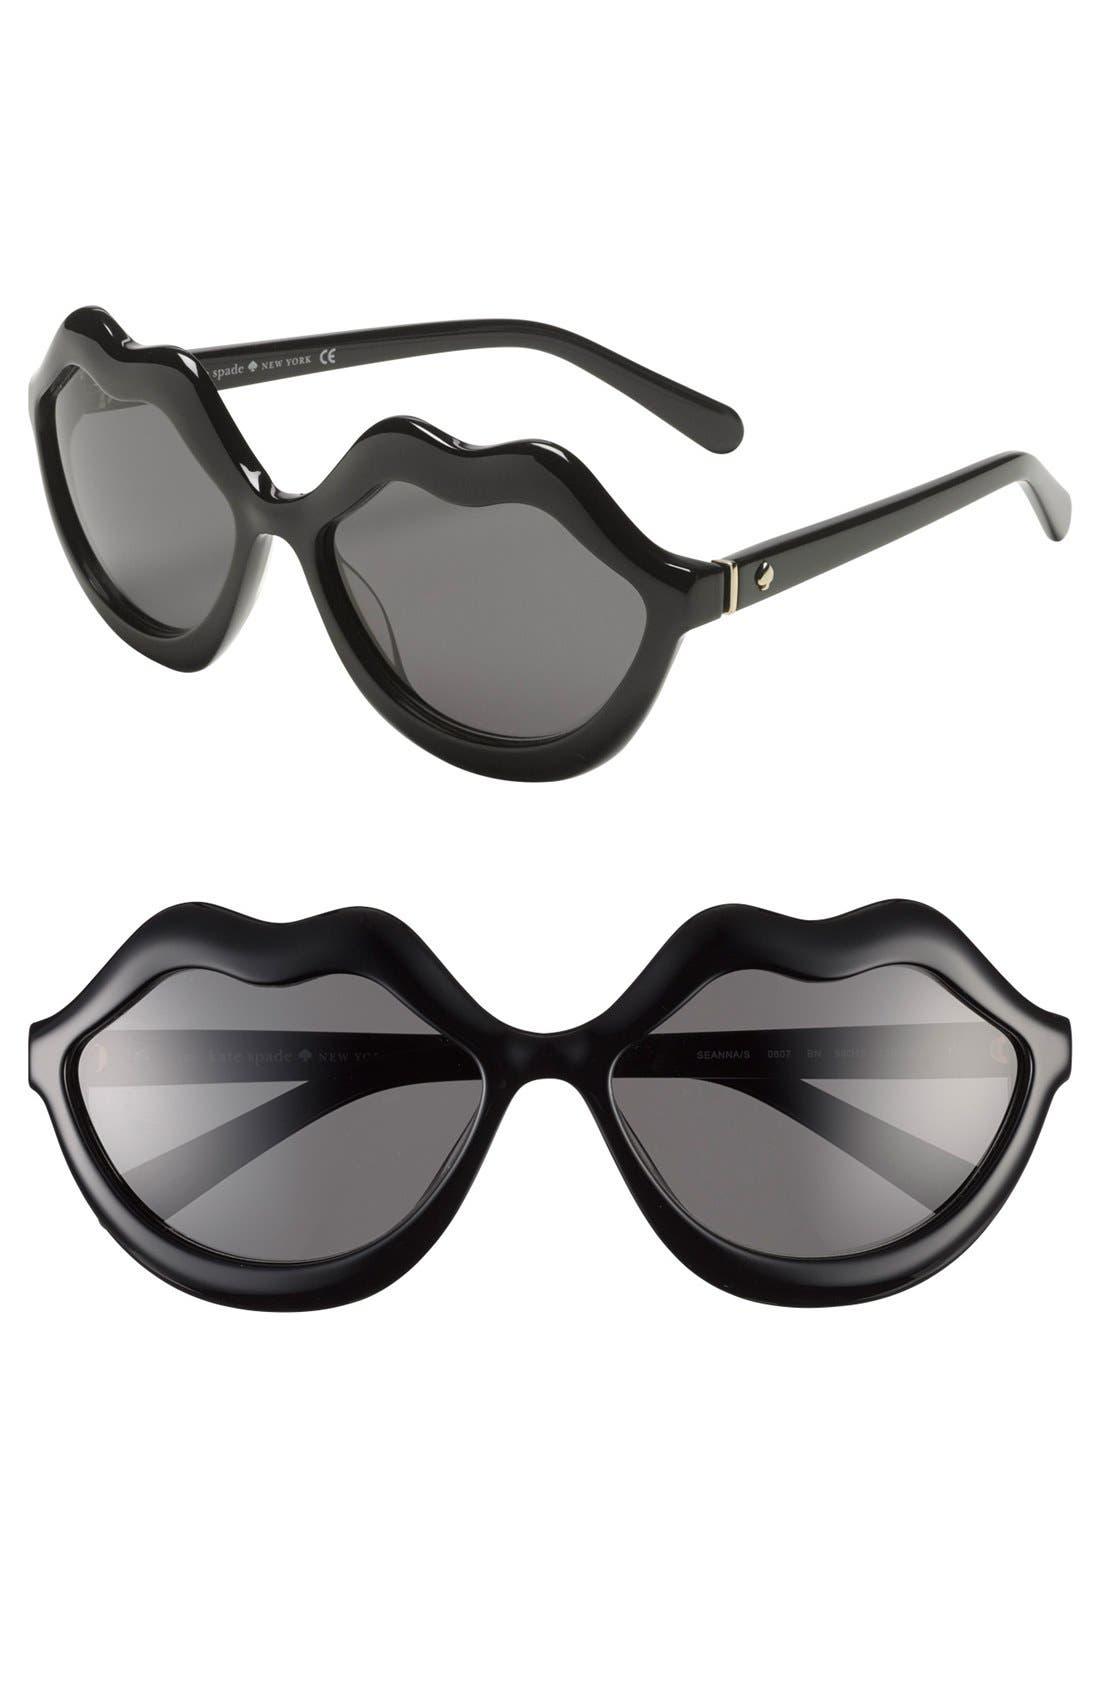 Main Image - kate spade new york 'seanns' 59mm sunglasses